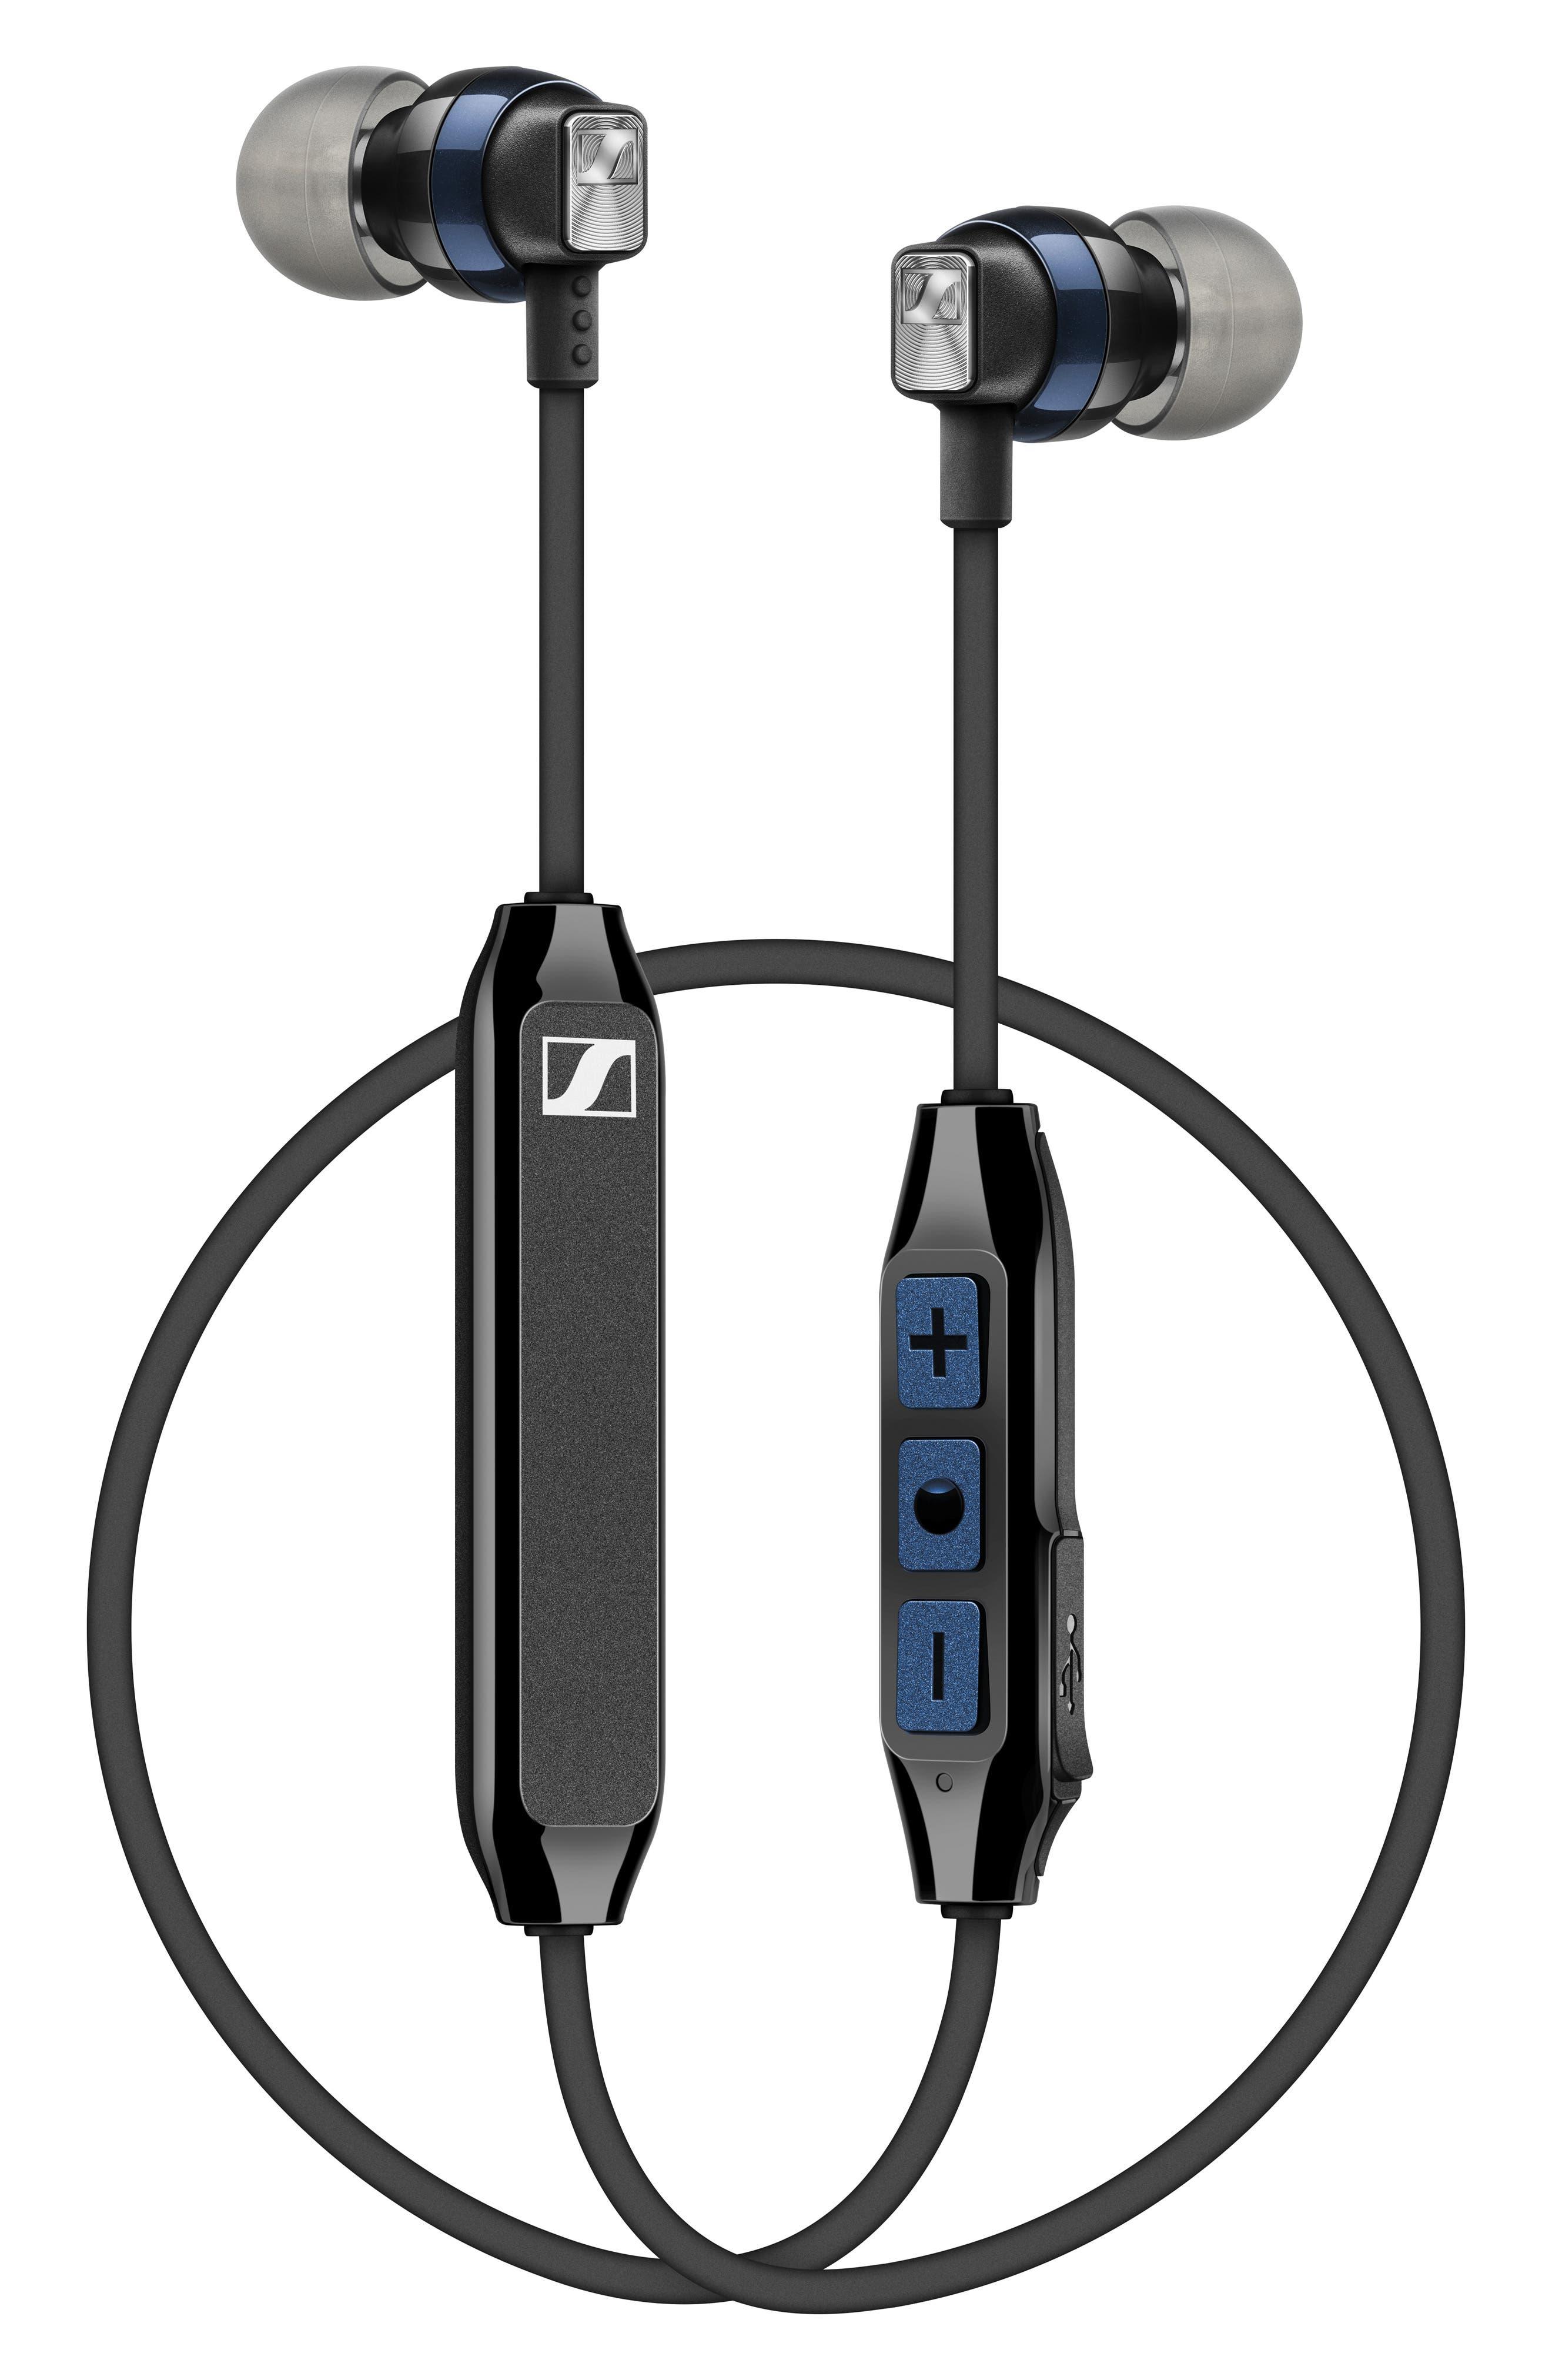 SENNHEISER,                             CX 6.00 Bluetooth<sup>®</sup> Wireless In-Ear Headphones,                             Alternate thumbnail 4, color,                             BLACK/ BLUE